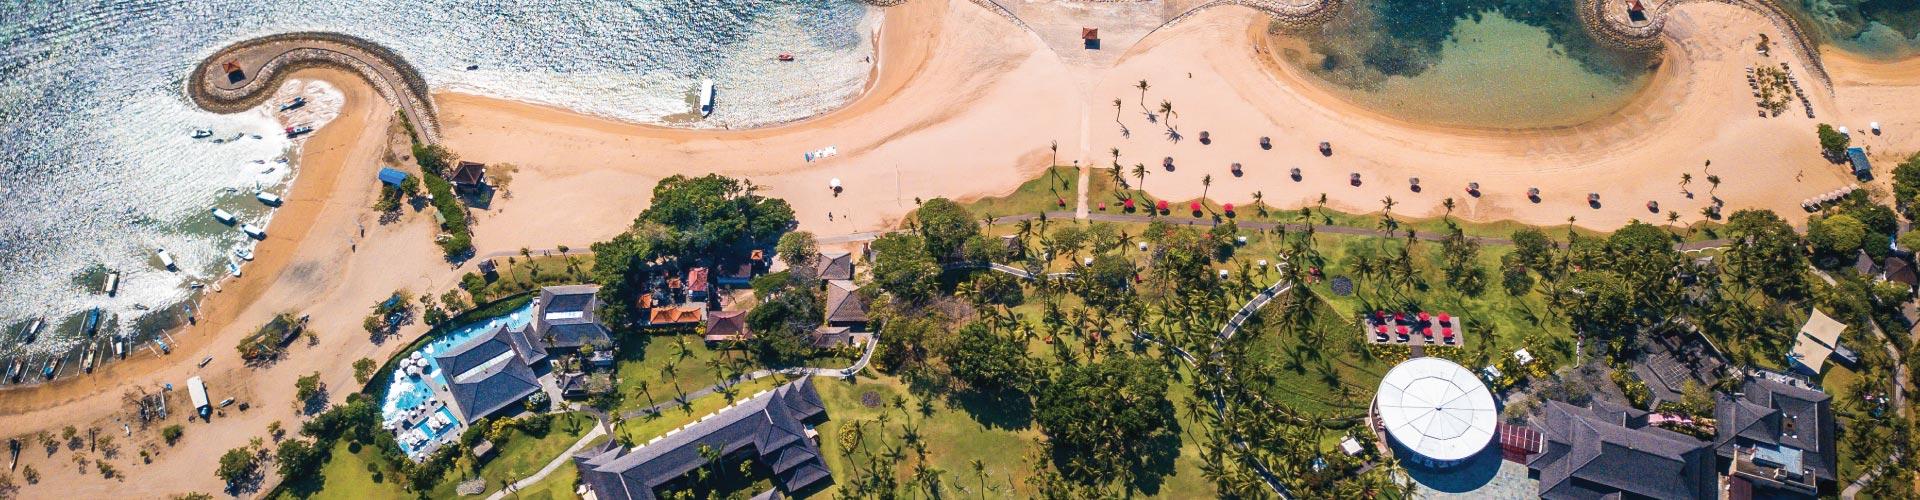 Club Med Resorts Around the World